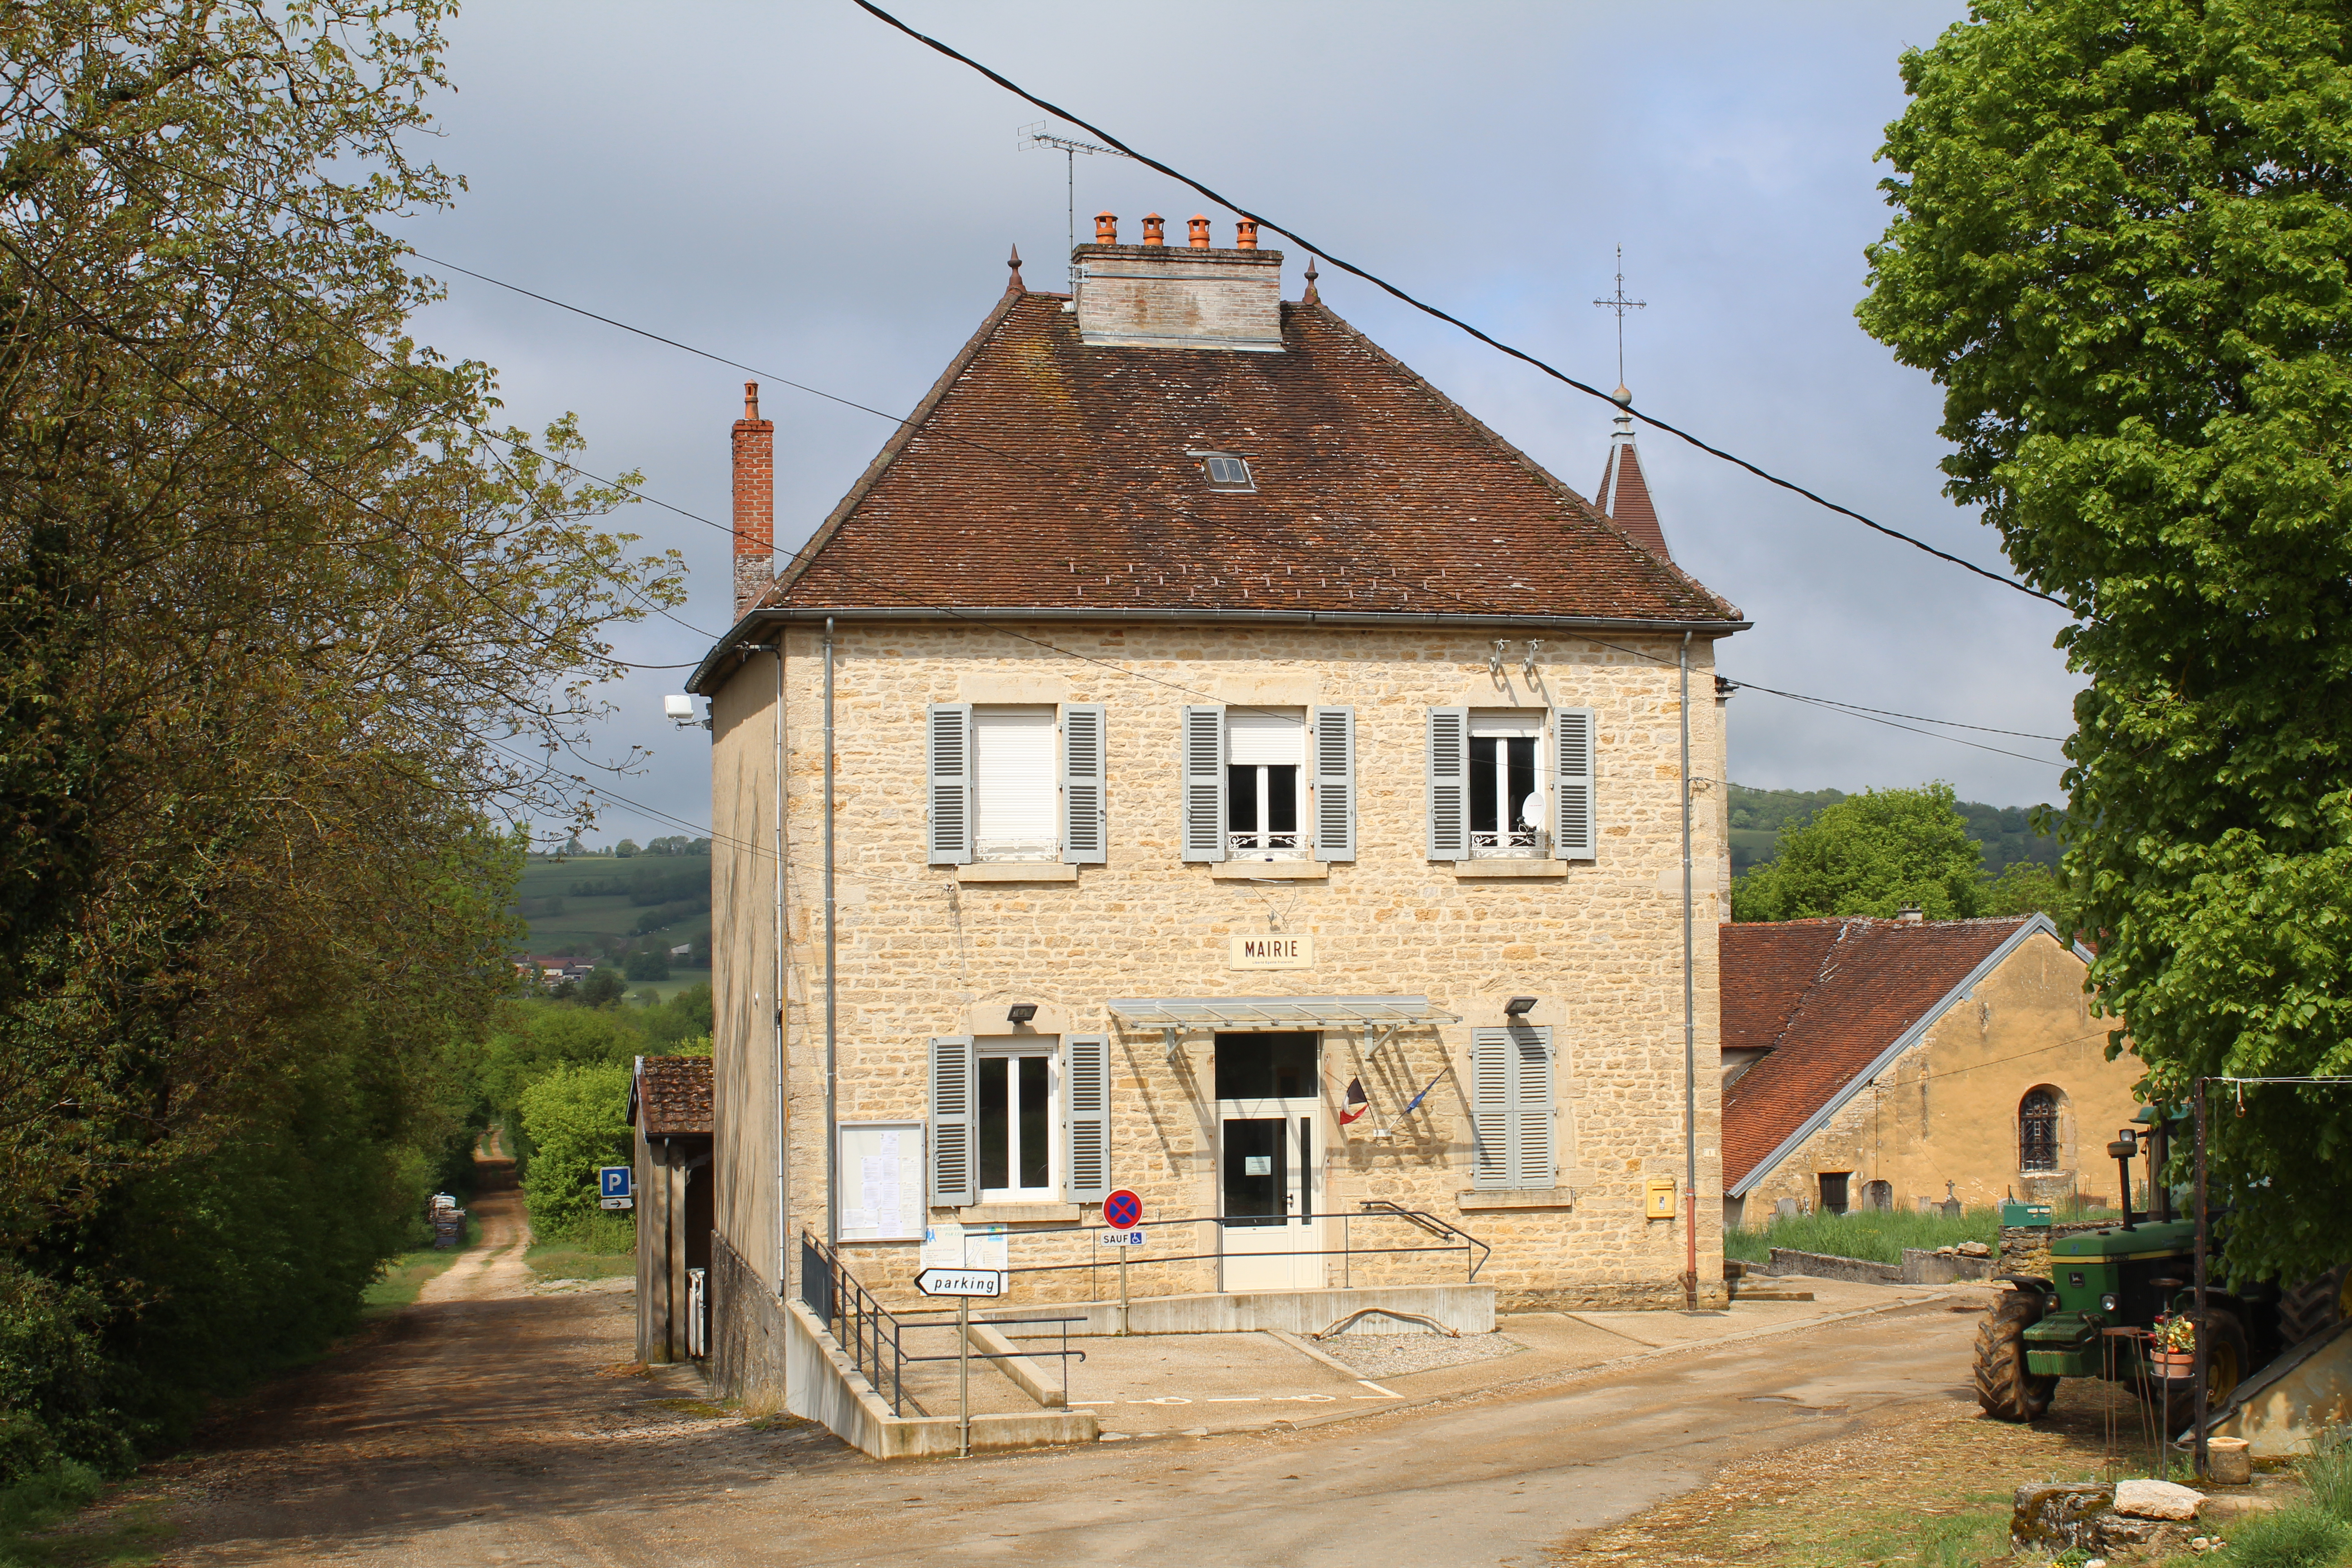 La Maison Du Bois Clairvaux rosay, jura - wikipedia